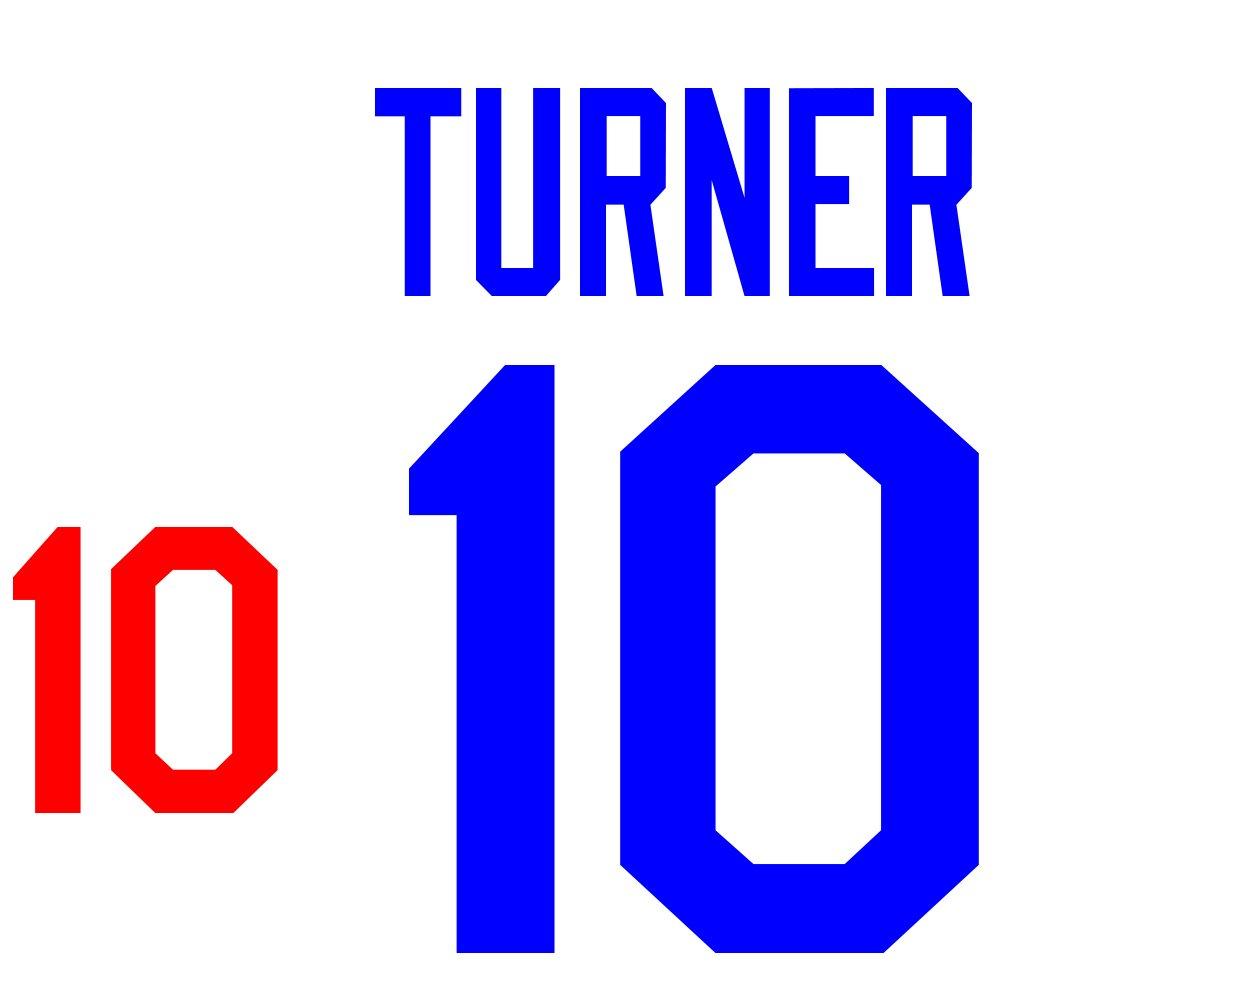 Justin Turner Los Angeles Dodgers Jersey Number Kit 2e9fe5c2e6e